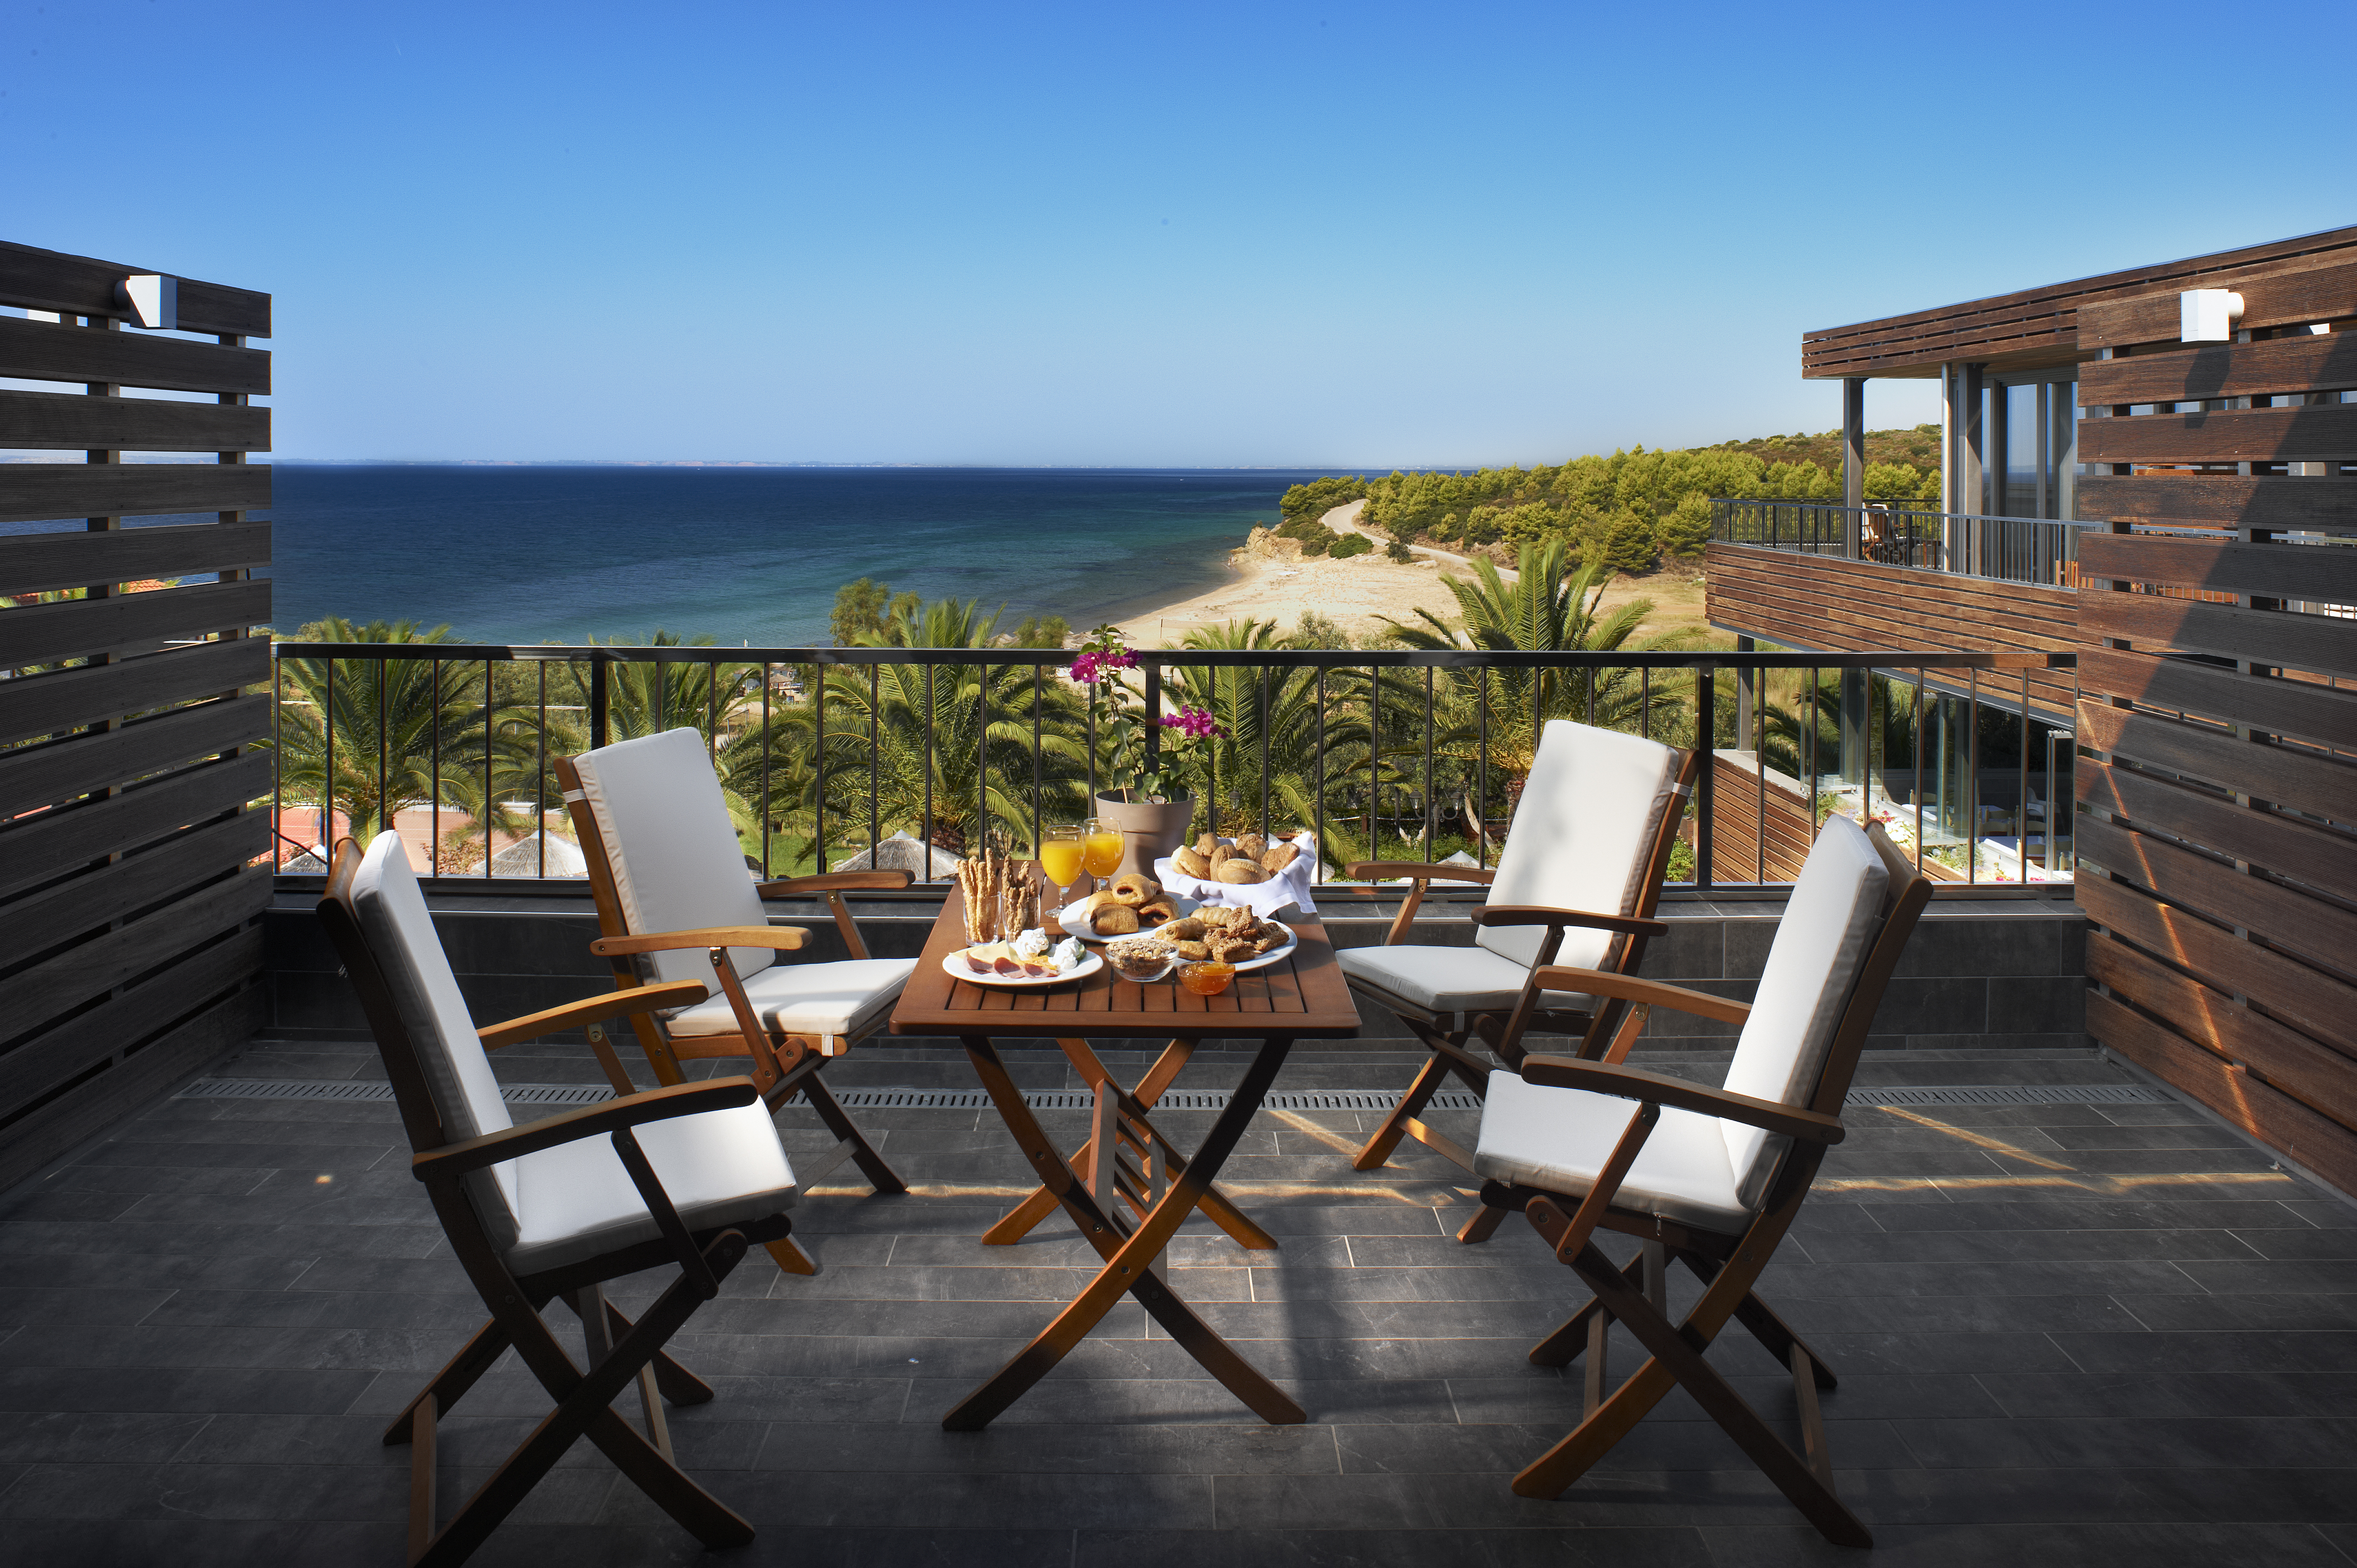 Anhemus Sea Beach Hotel